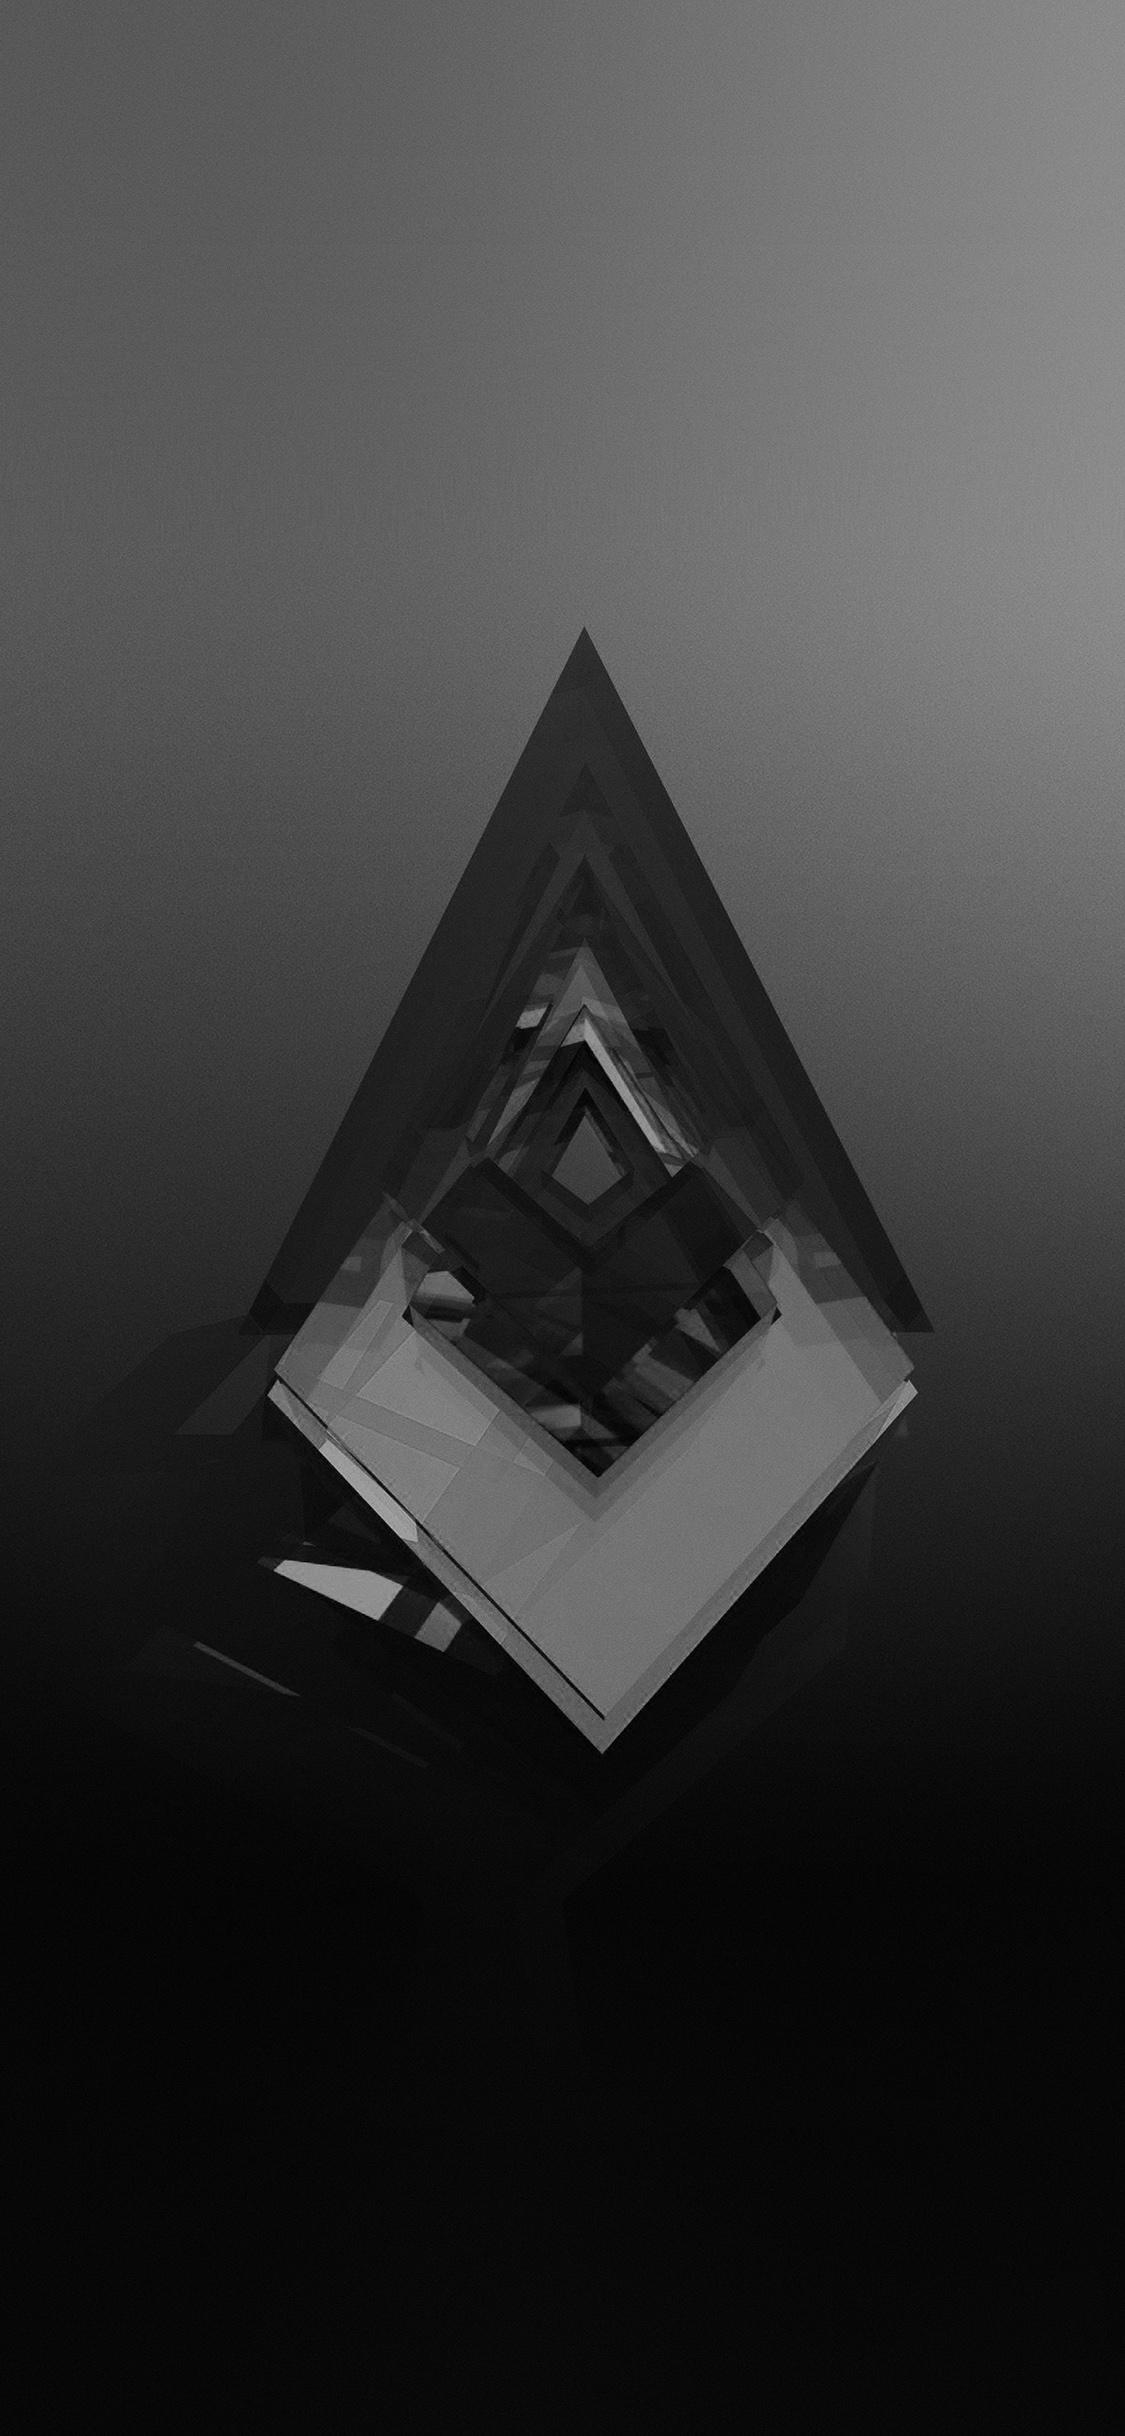 iPhoneXpapers.com-Apple-iPhone-wallpaper-ak03-symbol-abstract-dark-black